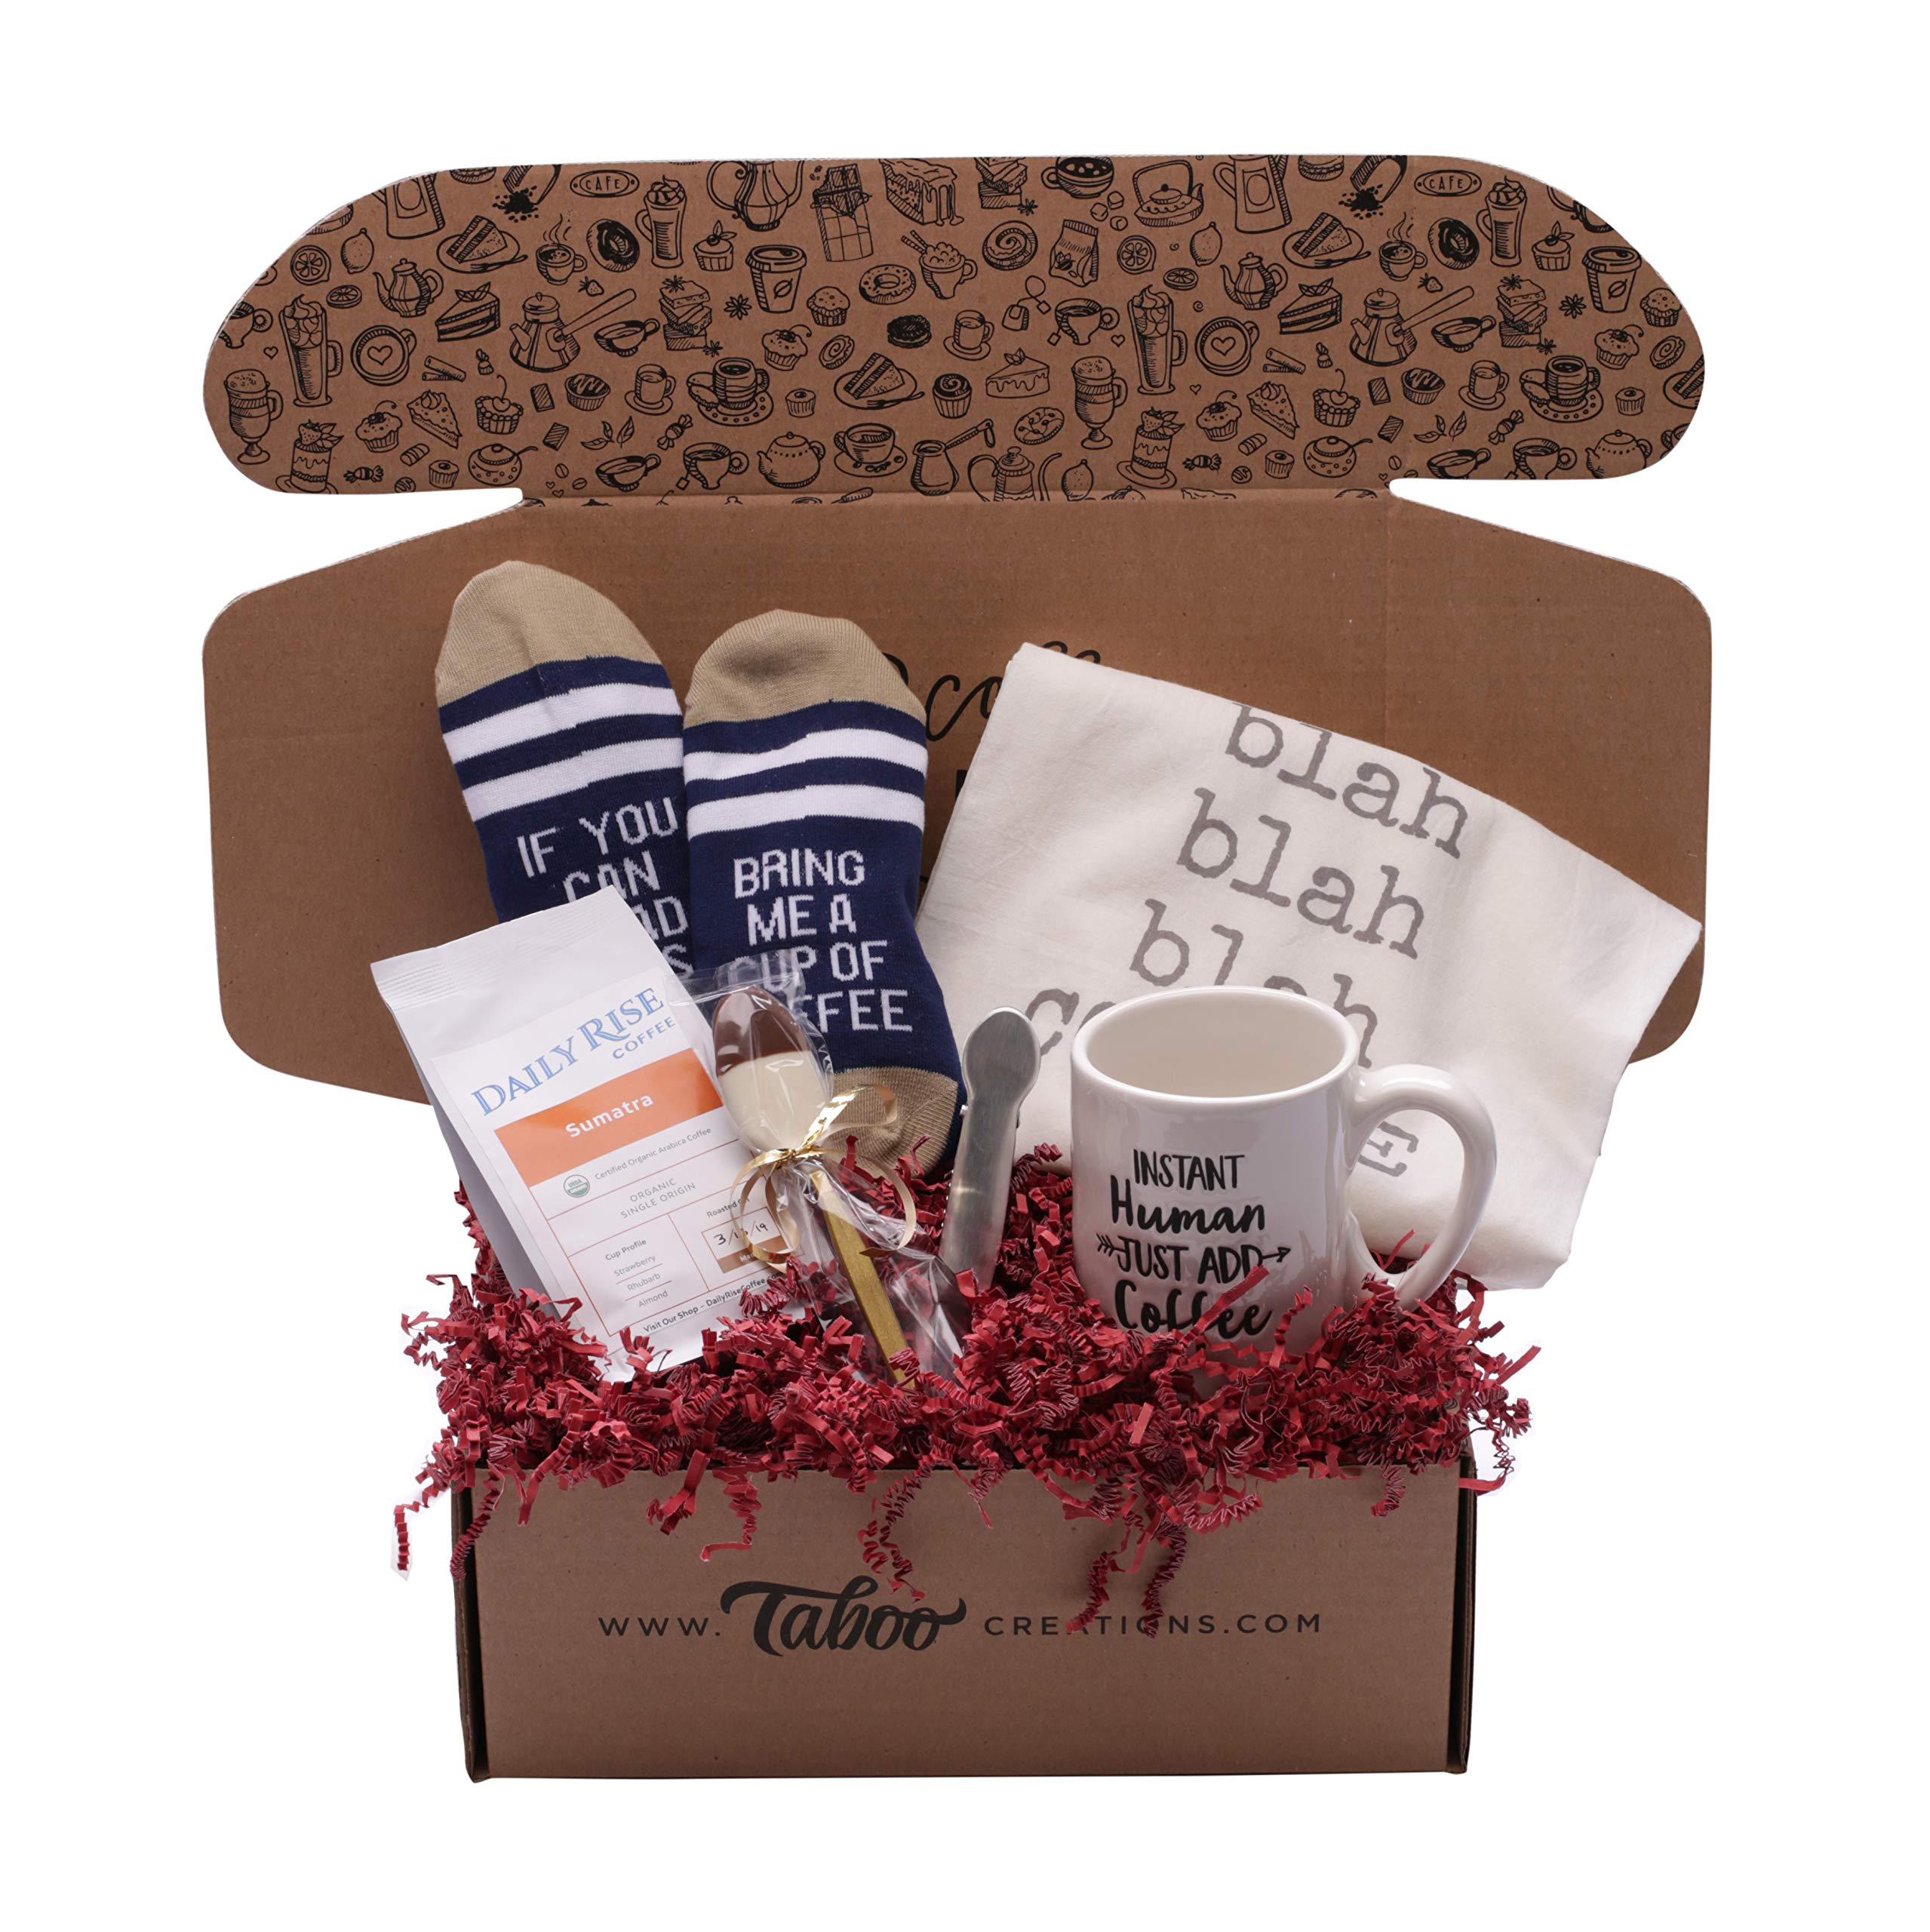 Taboo Creations Coffee Lovers Gift Basket Box - Fun & Unique Gift Box for Coffee Lovers by Taboo Creations